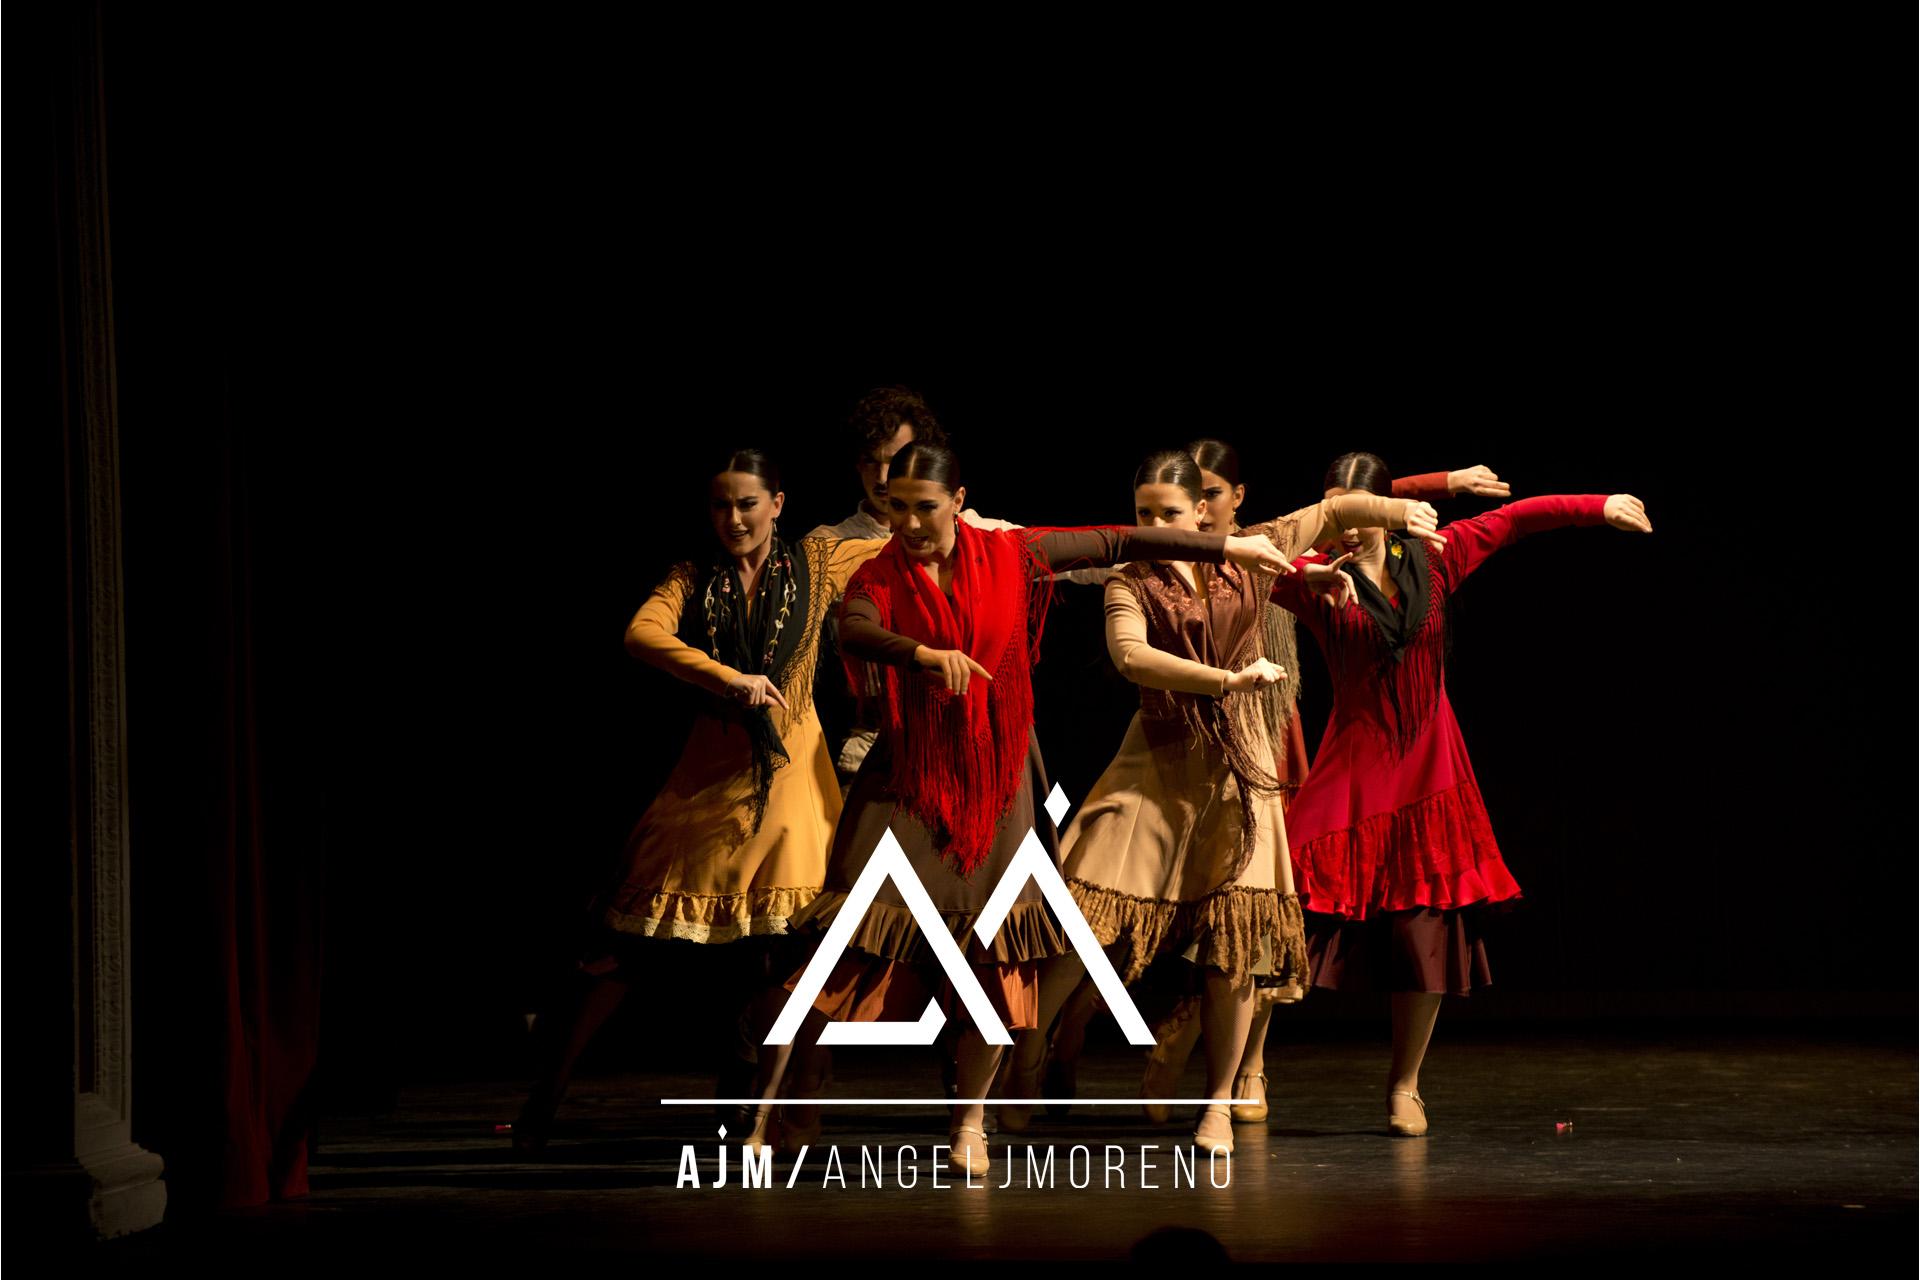 Fotografias de certámenes de danza